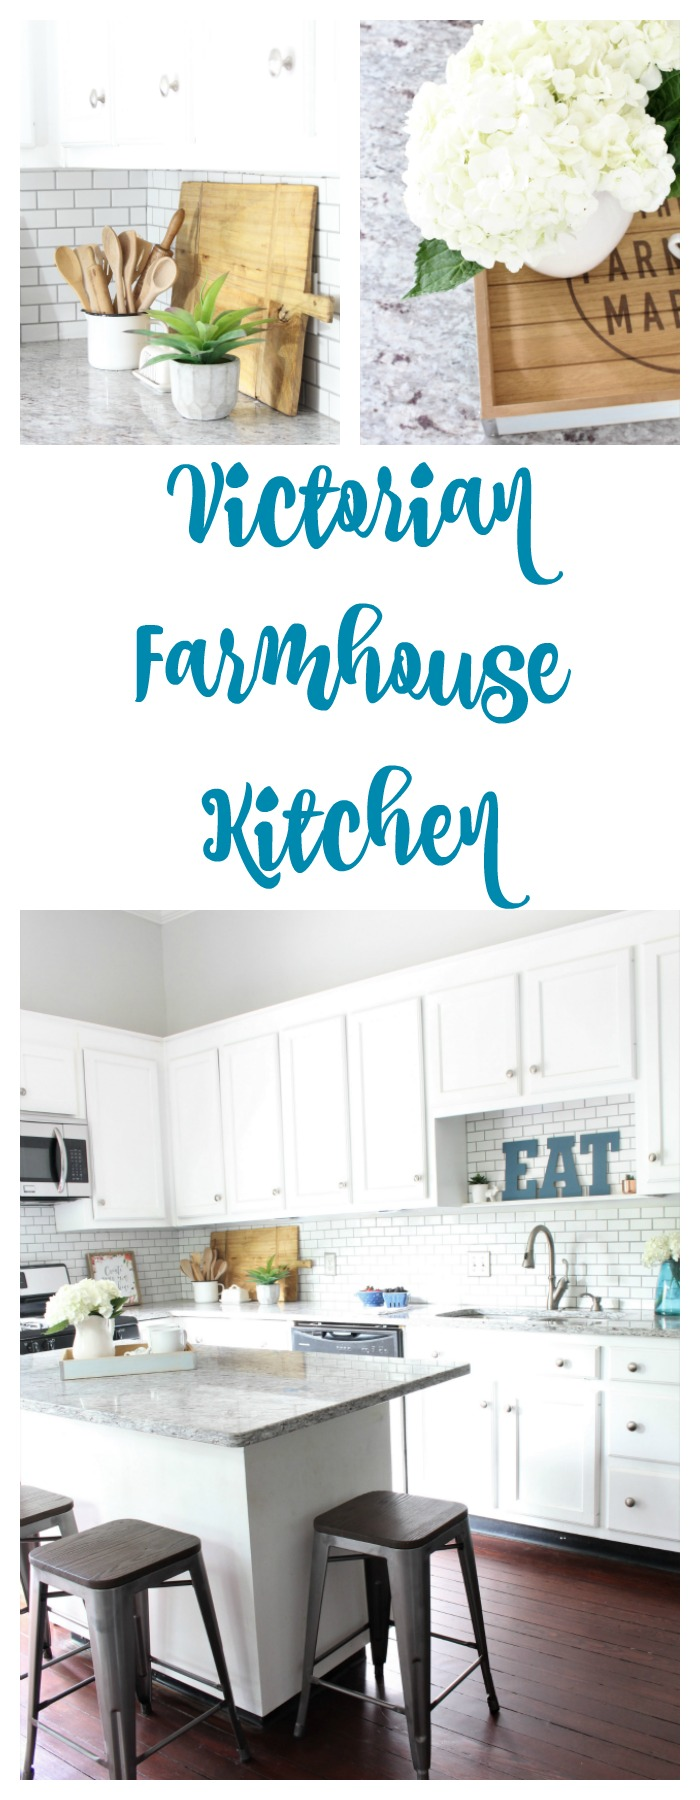 Victorian Farmhouse Kitchen